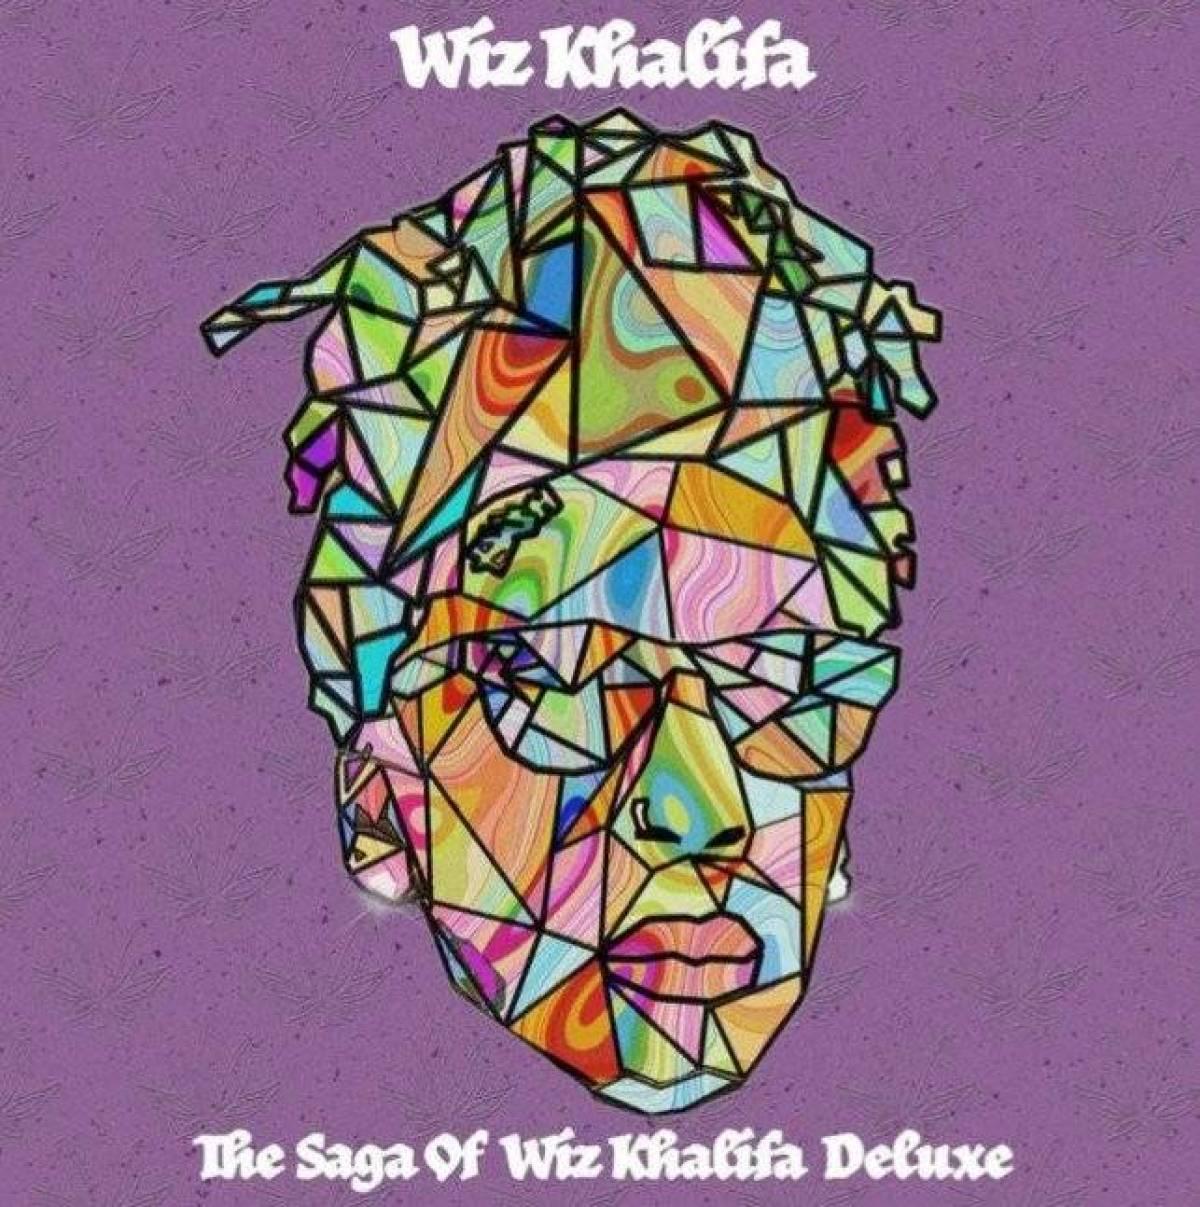 Wiz Khalifa Ft. Rubi Rose – POV MP3 DOWNLOAD FREE